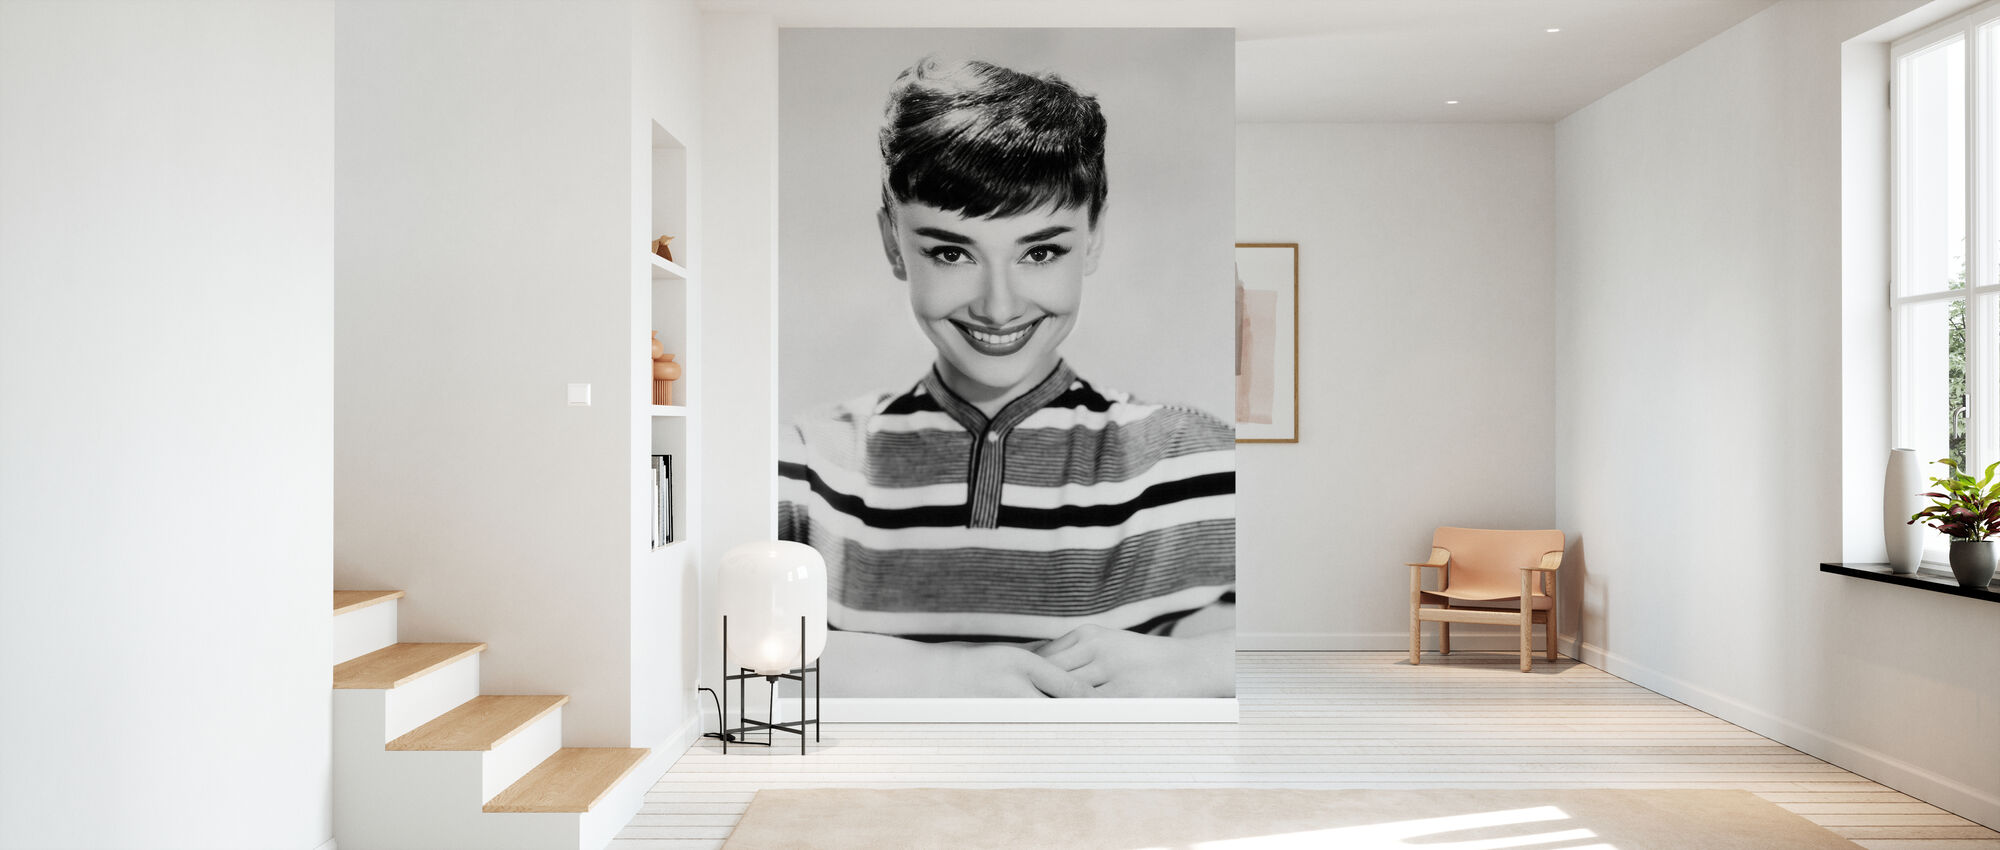 Aud in Stripes - Wallpaper - Hallway